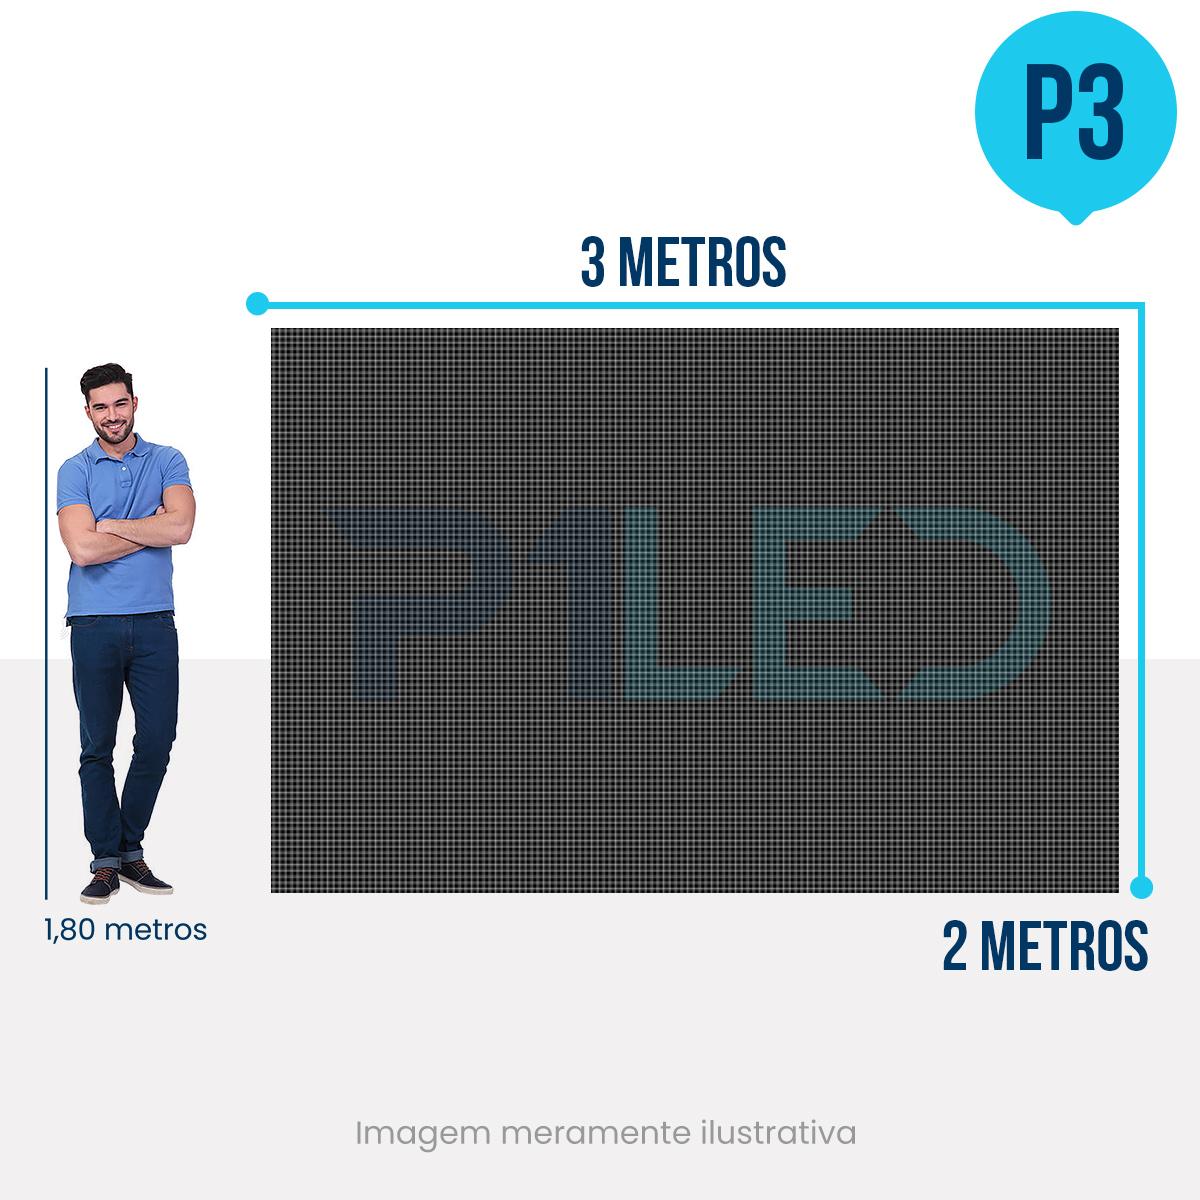 Painel de LED para Padaria 3x2 - Telão P3 Indoor  - Painel e Telão de LED - O Melhor Preço em Painel de LED | P1LED